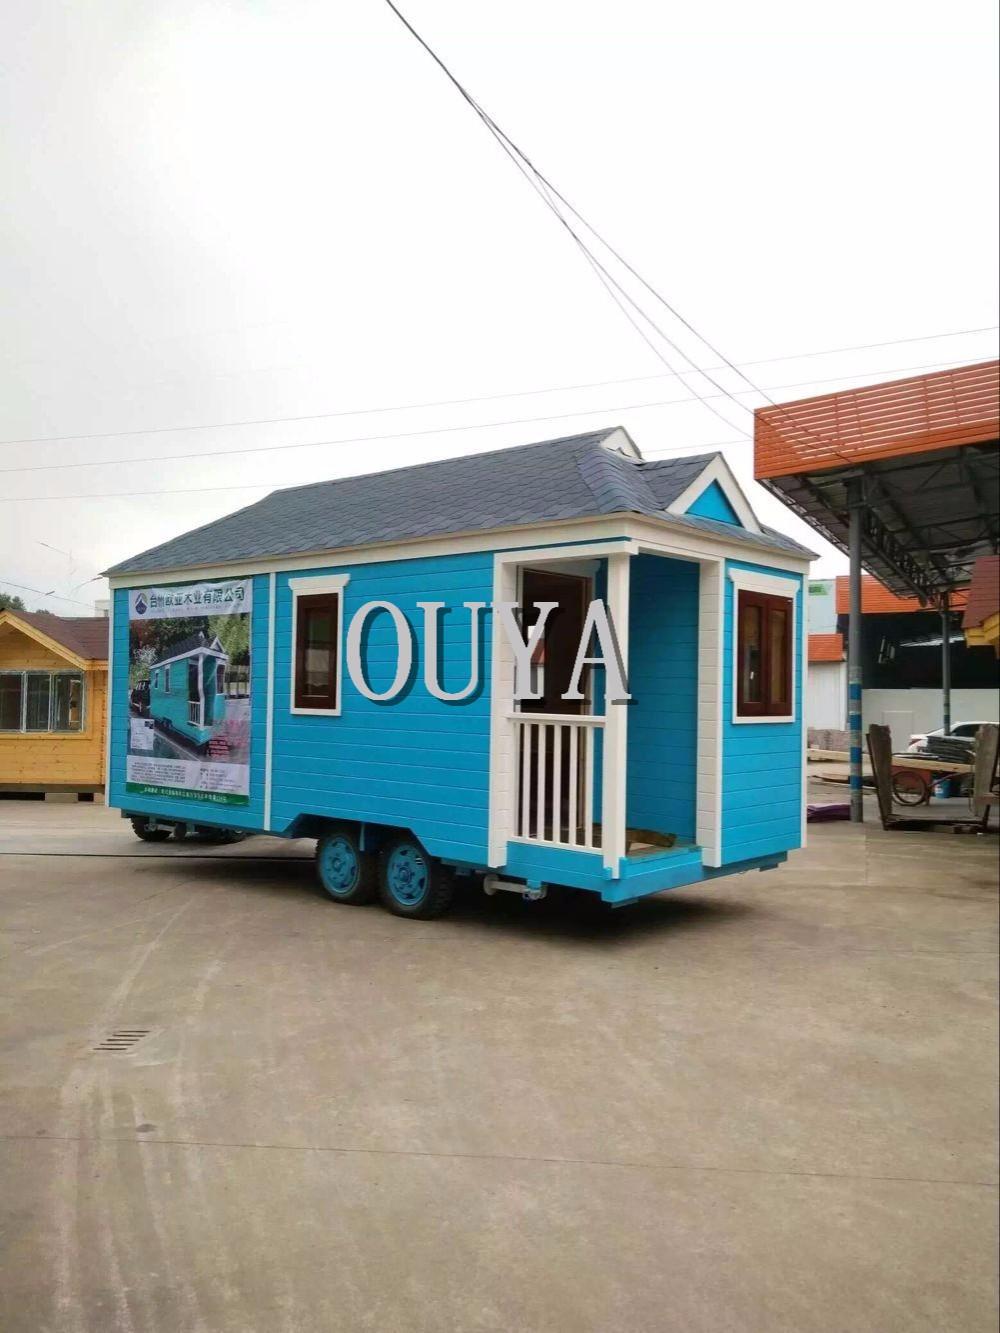 2017 beliebten fertig tiny haus auf r dern mobile werkstatt anh nger faltbare haus caravan f r. Black Bedroom Furniture Sets. Home Design Ideas